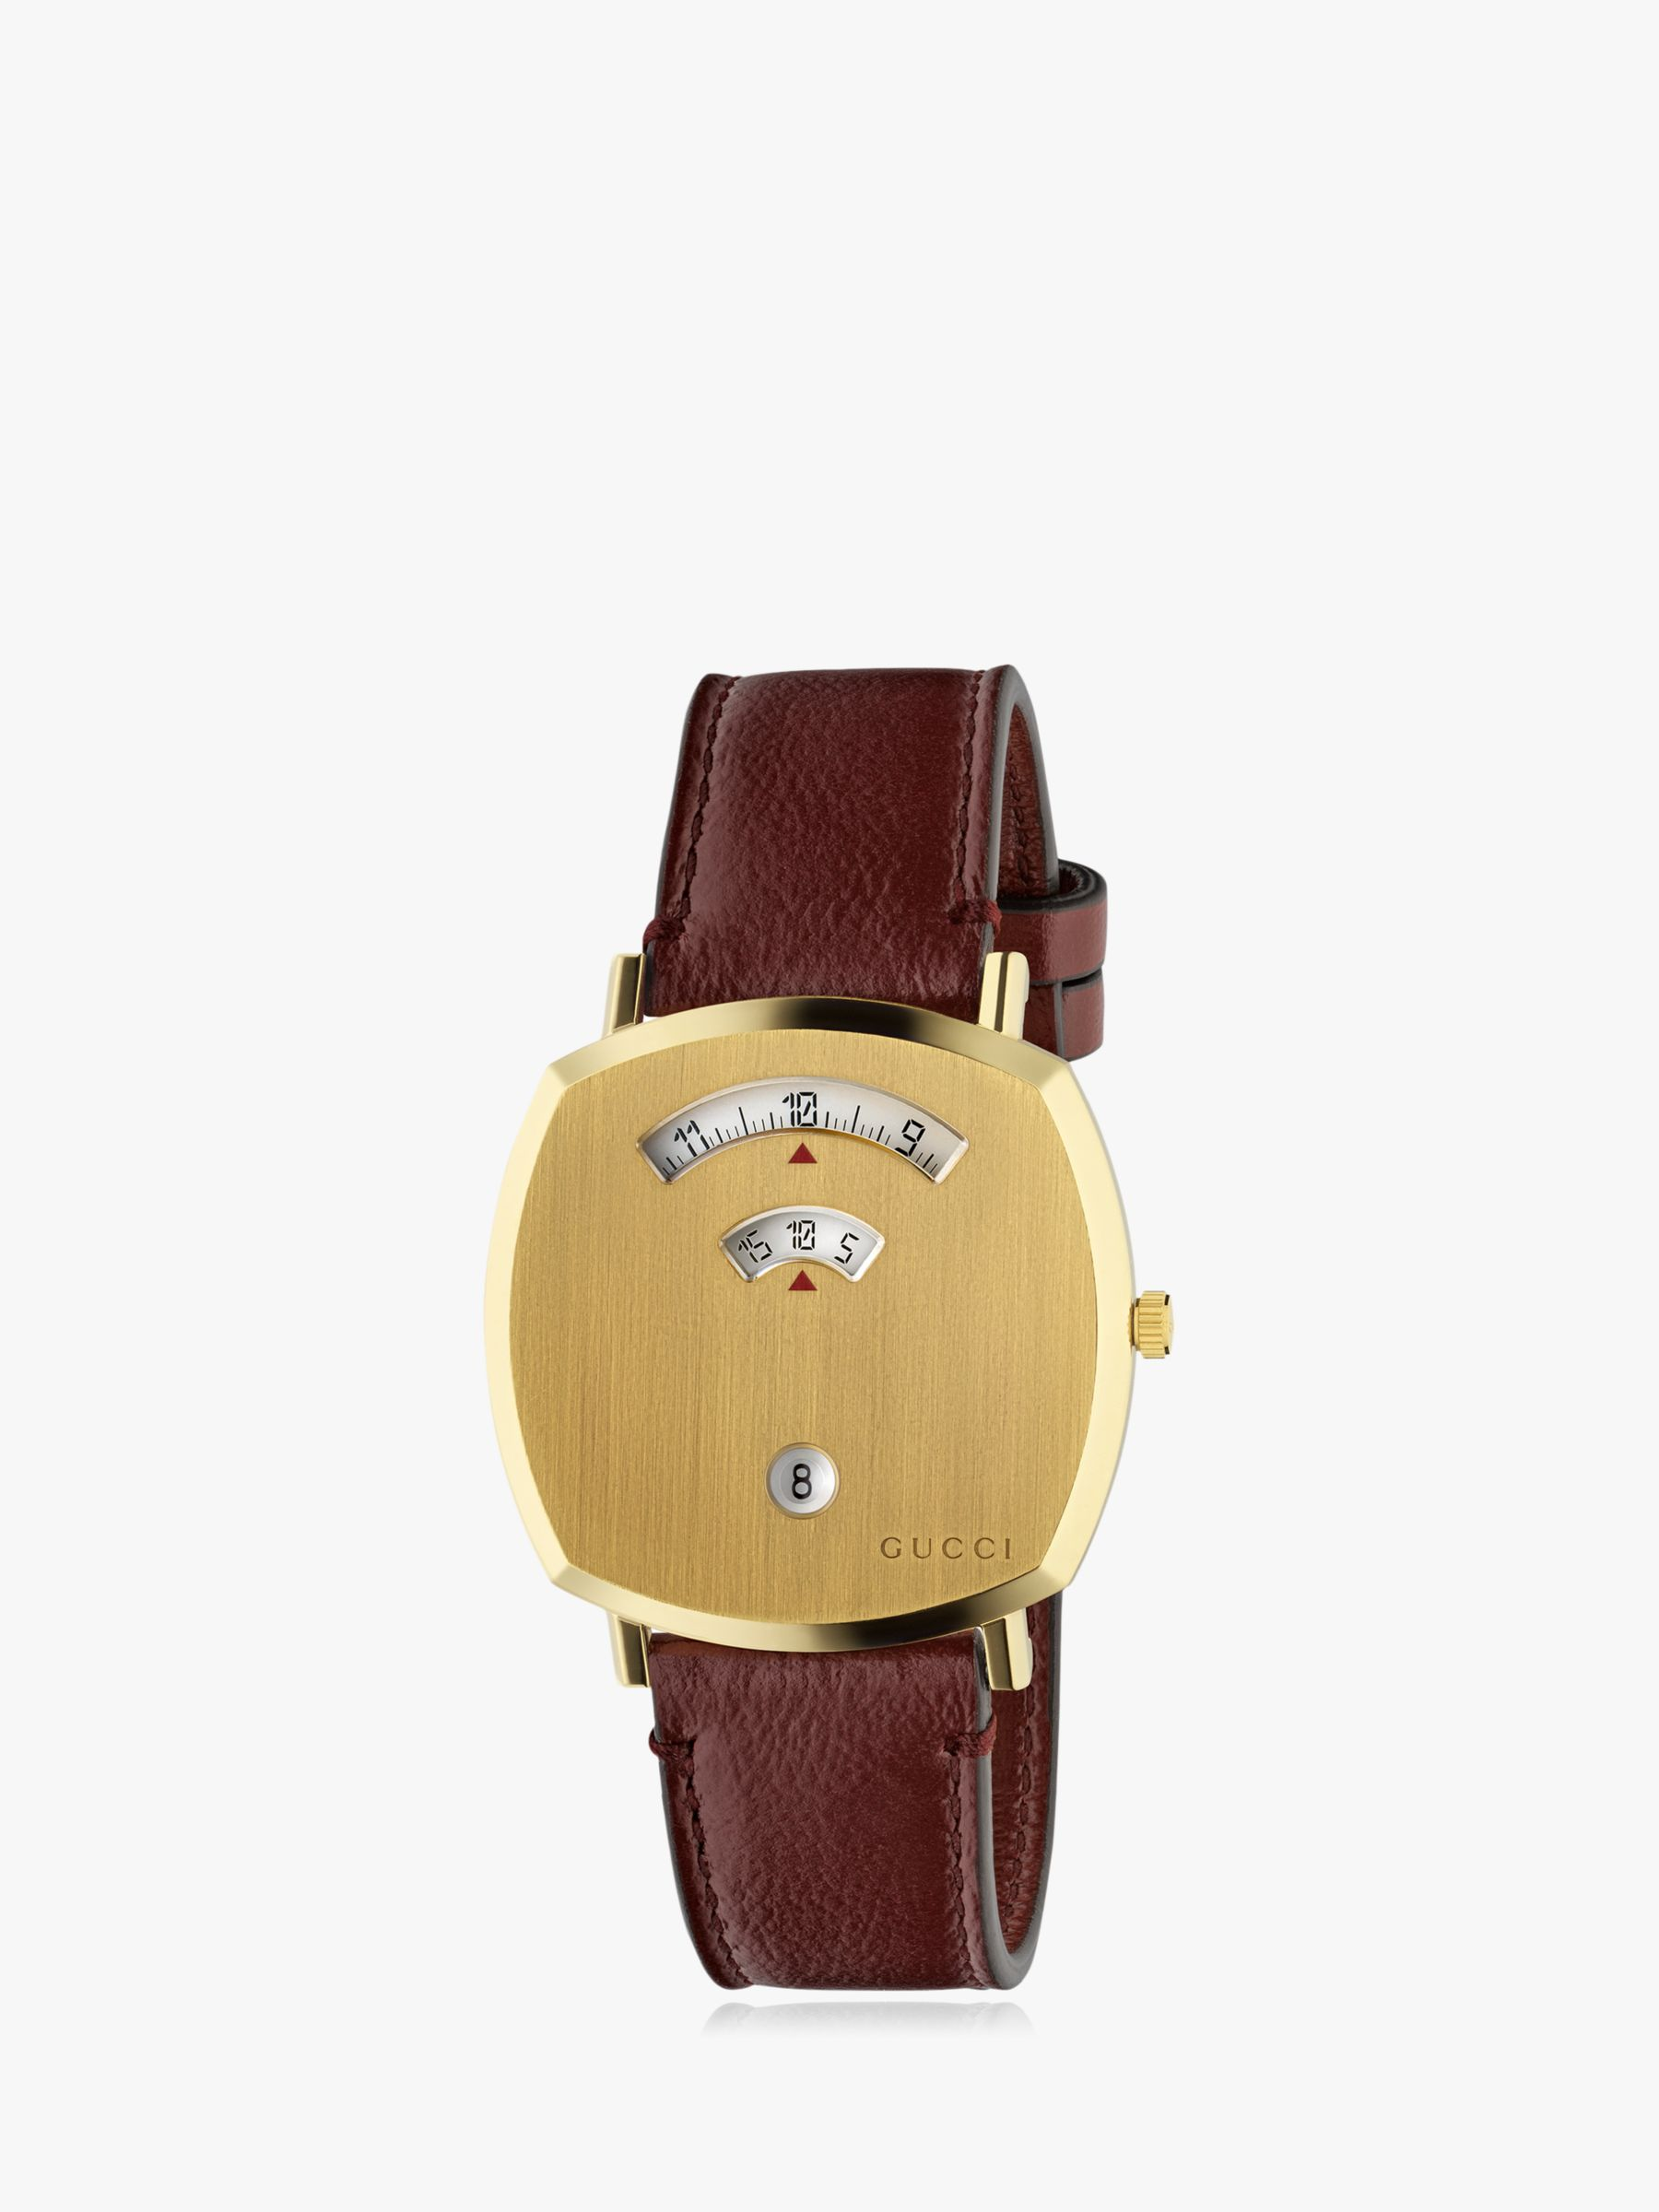 Gucci Gucci YA157410 Unisex Grip Date Leather Strap Watch, Gold